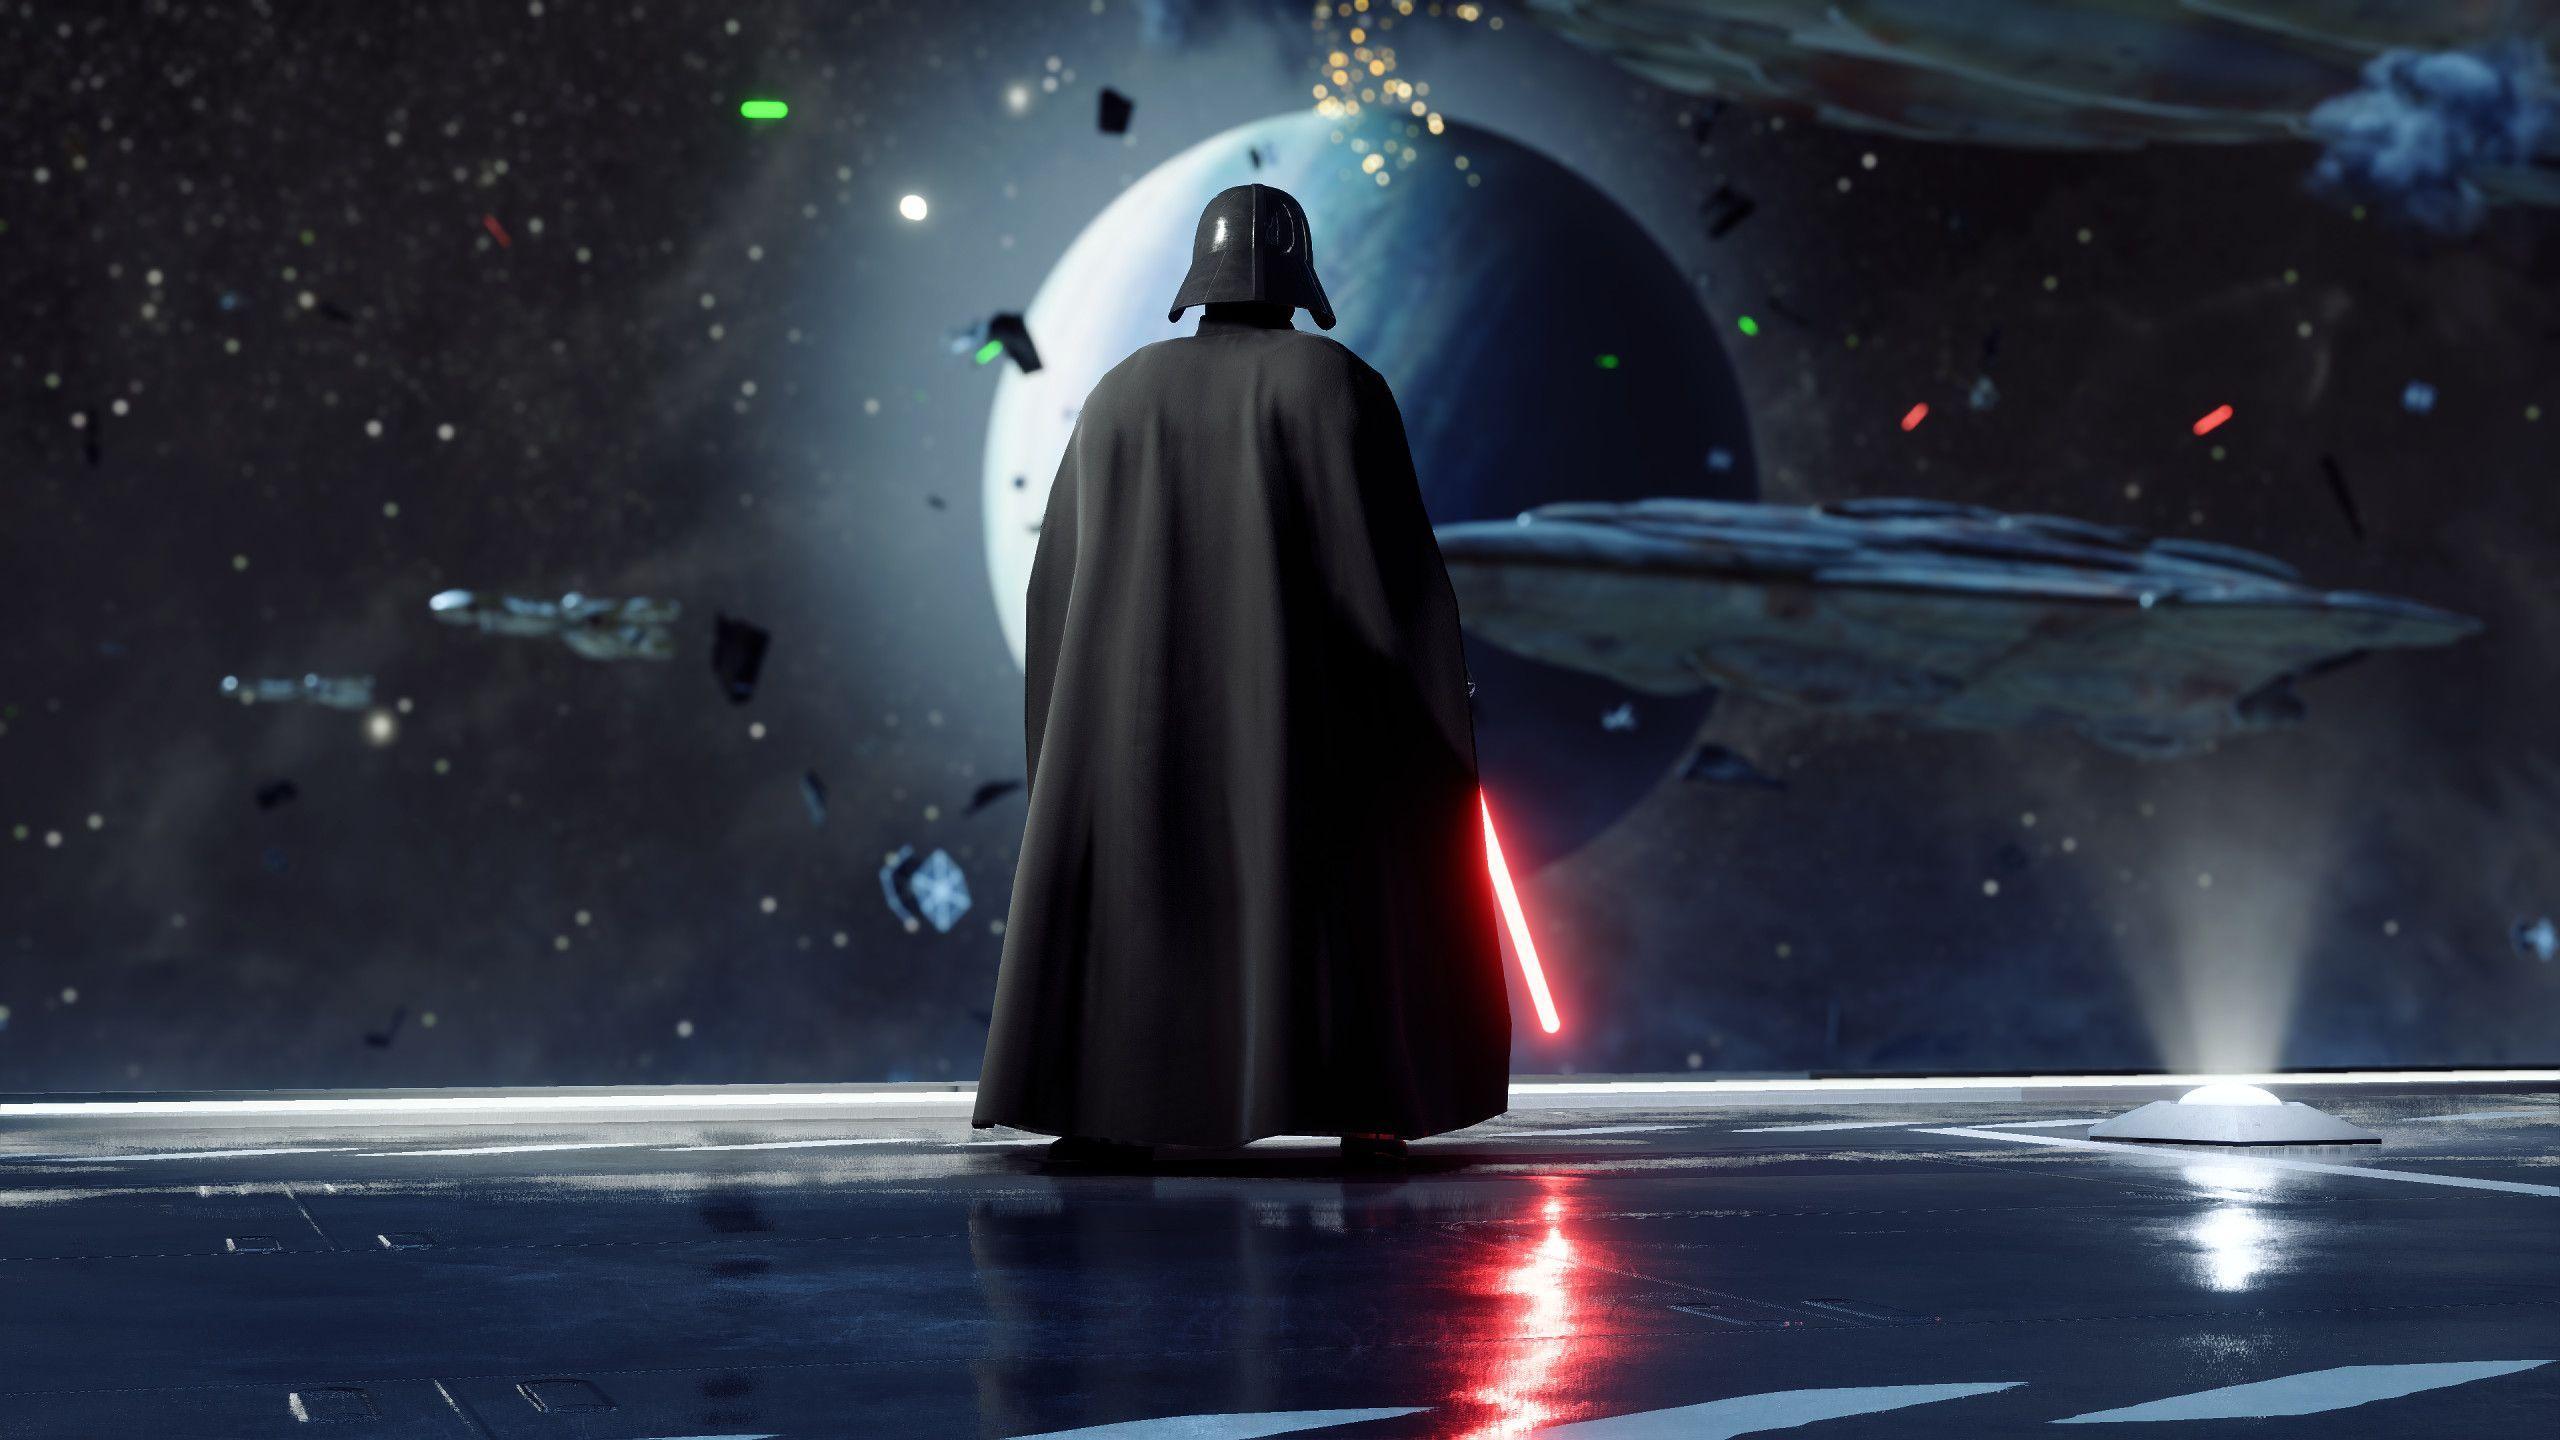 Darth Vader Wallpapers Wallpaper Cave